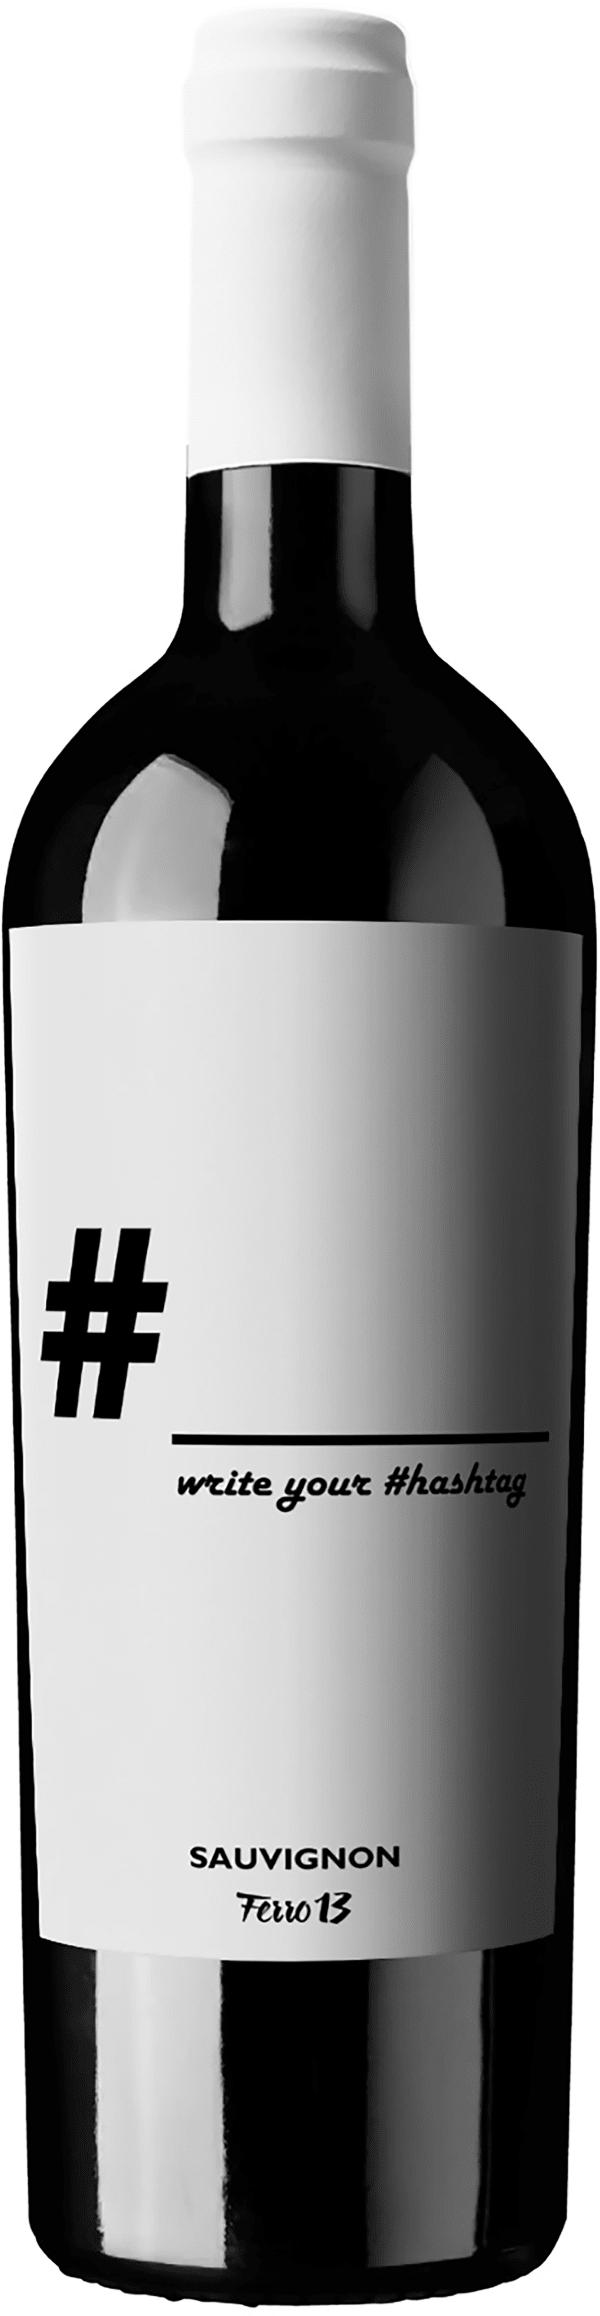 Hashtag Sauvignon 2019